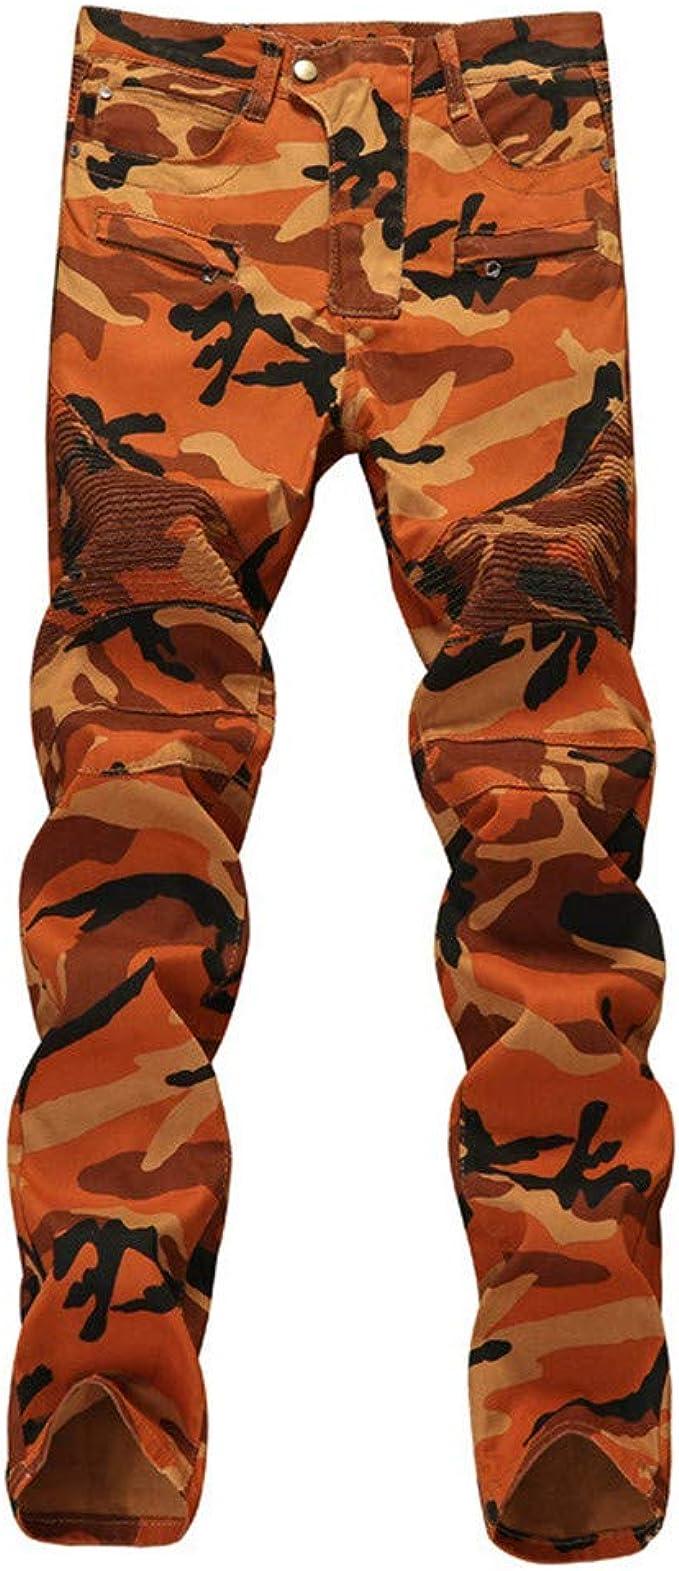 Mens Skinny Camo Military Cargo Jeans Biker Pocket Denim Pants Slim Fit Trousers